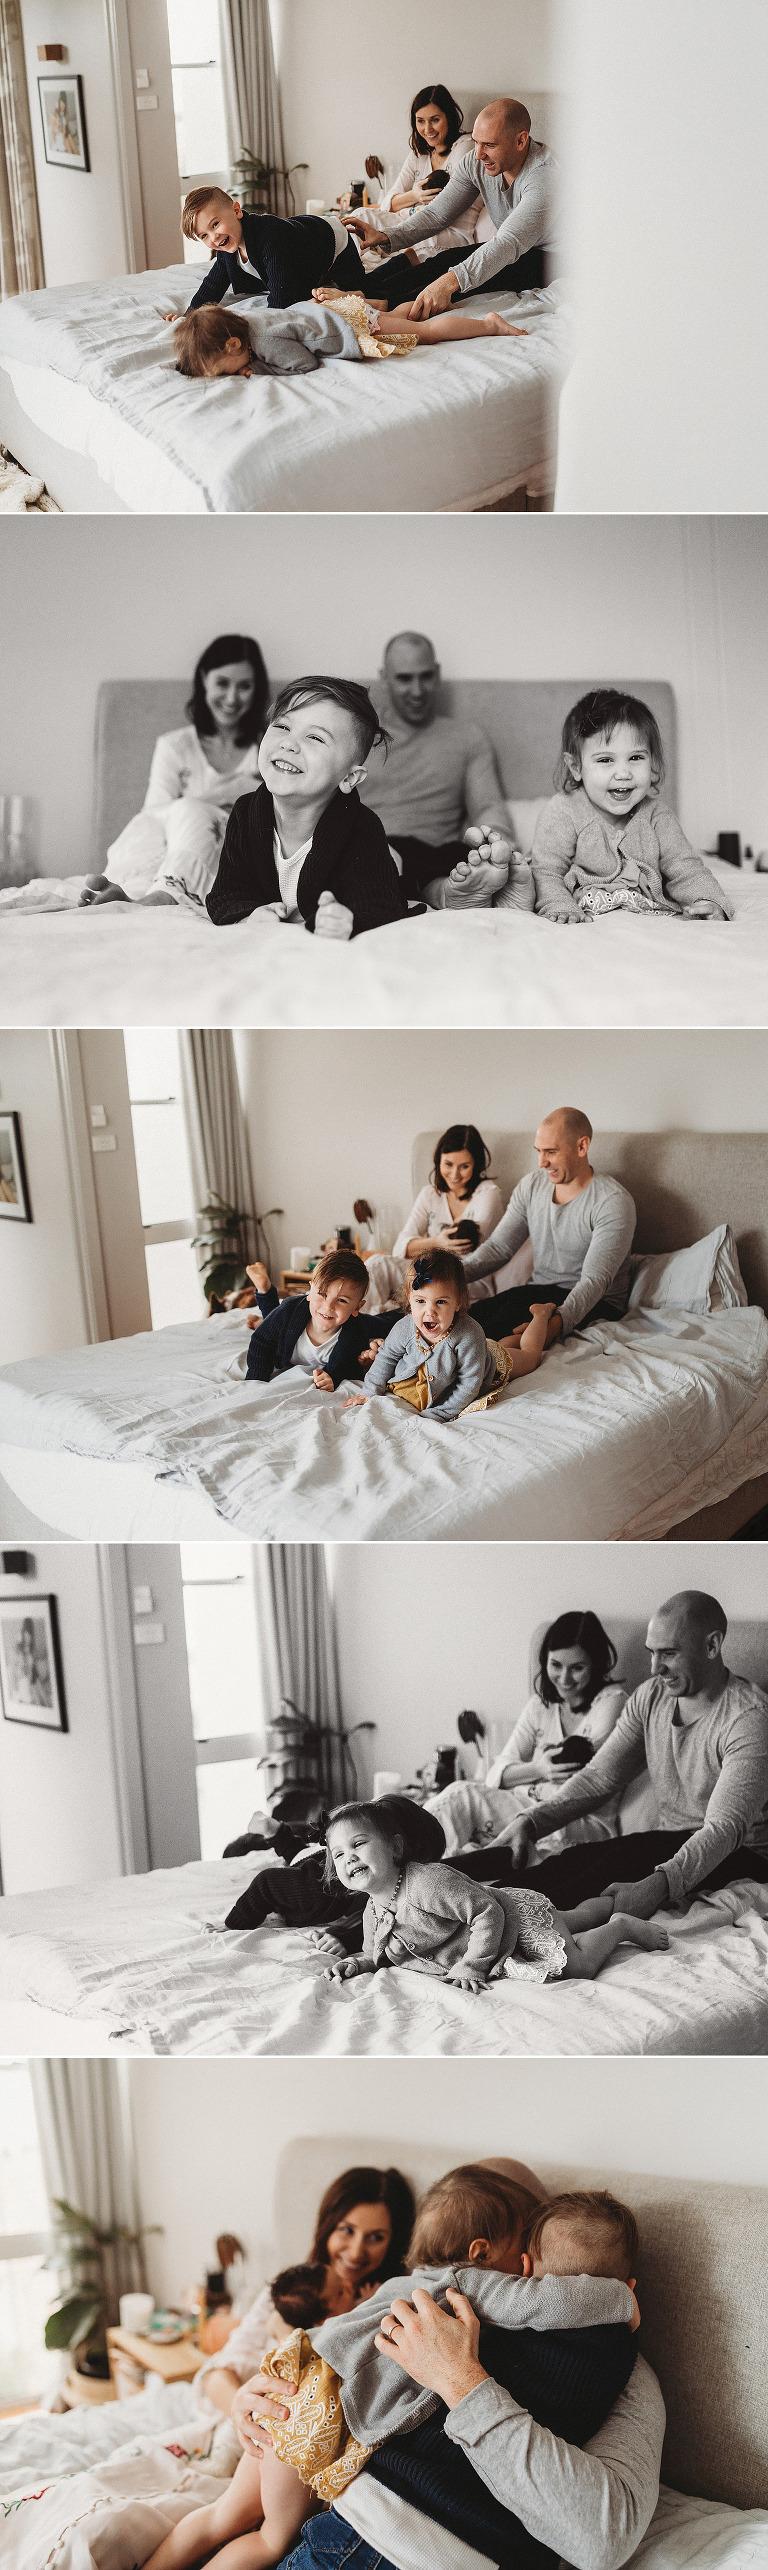 Fun-in-home-newborn-photography-sutherland-shire-sydney